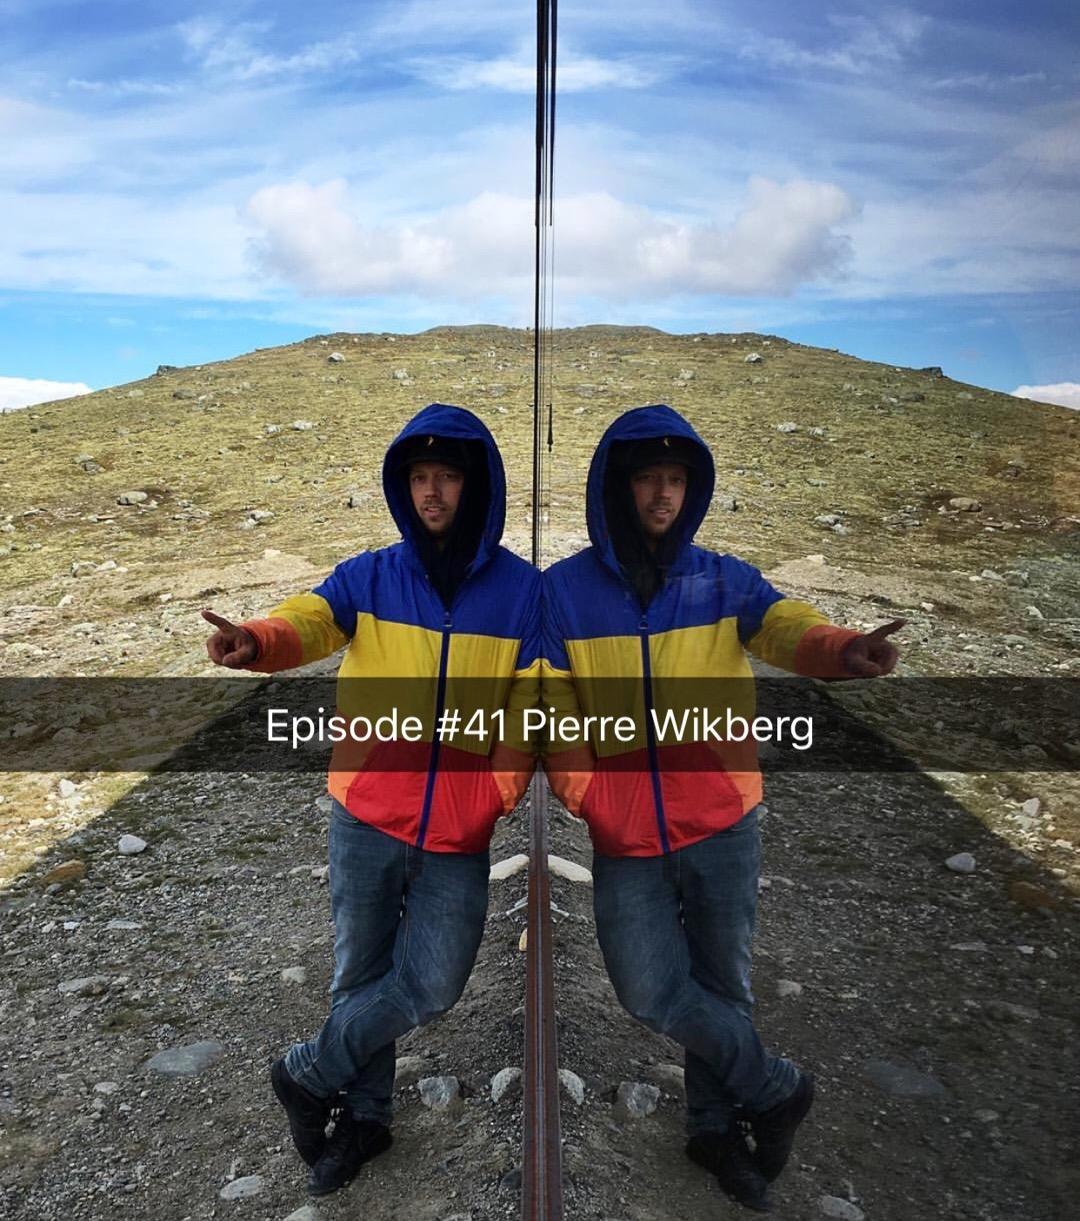 Pierre Wikberg | Filming | Politics & Religion | #Skatetourism | Focus